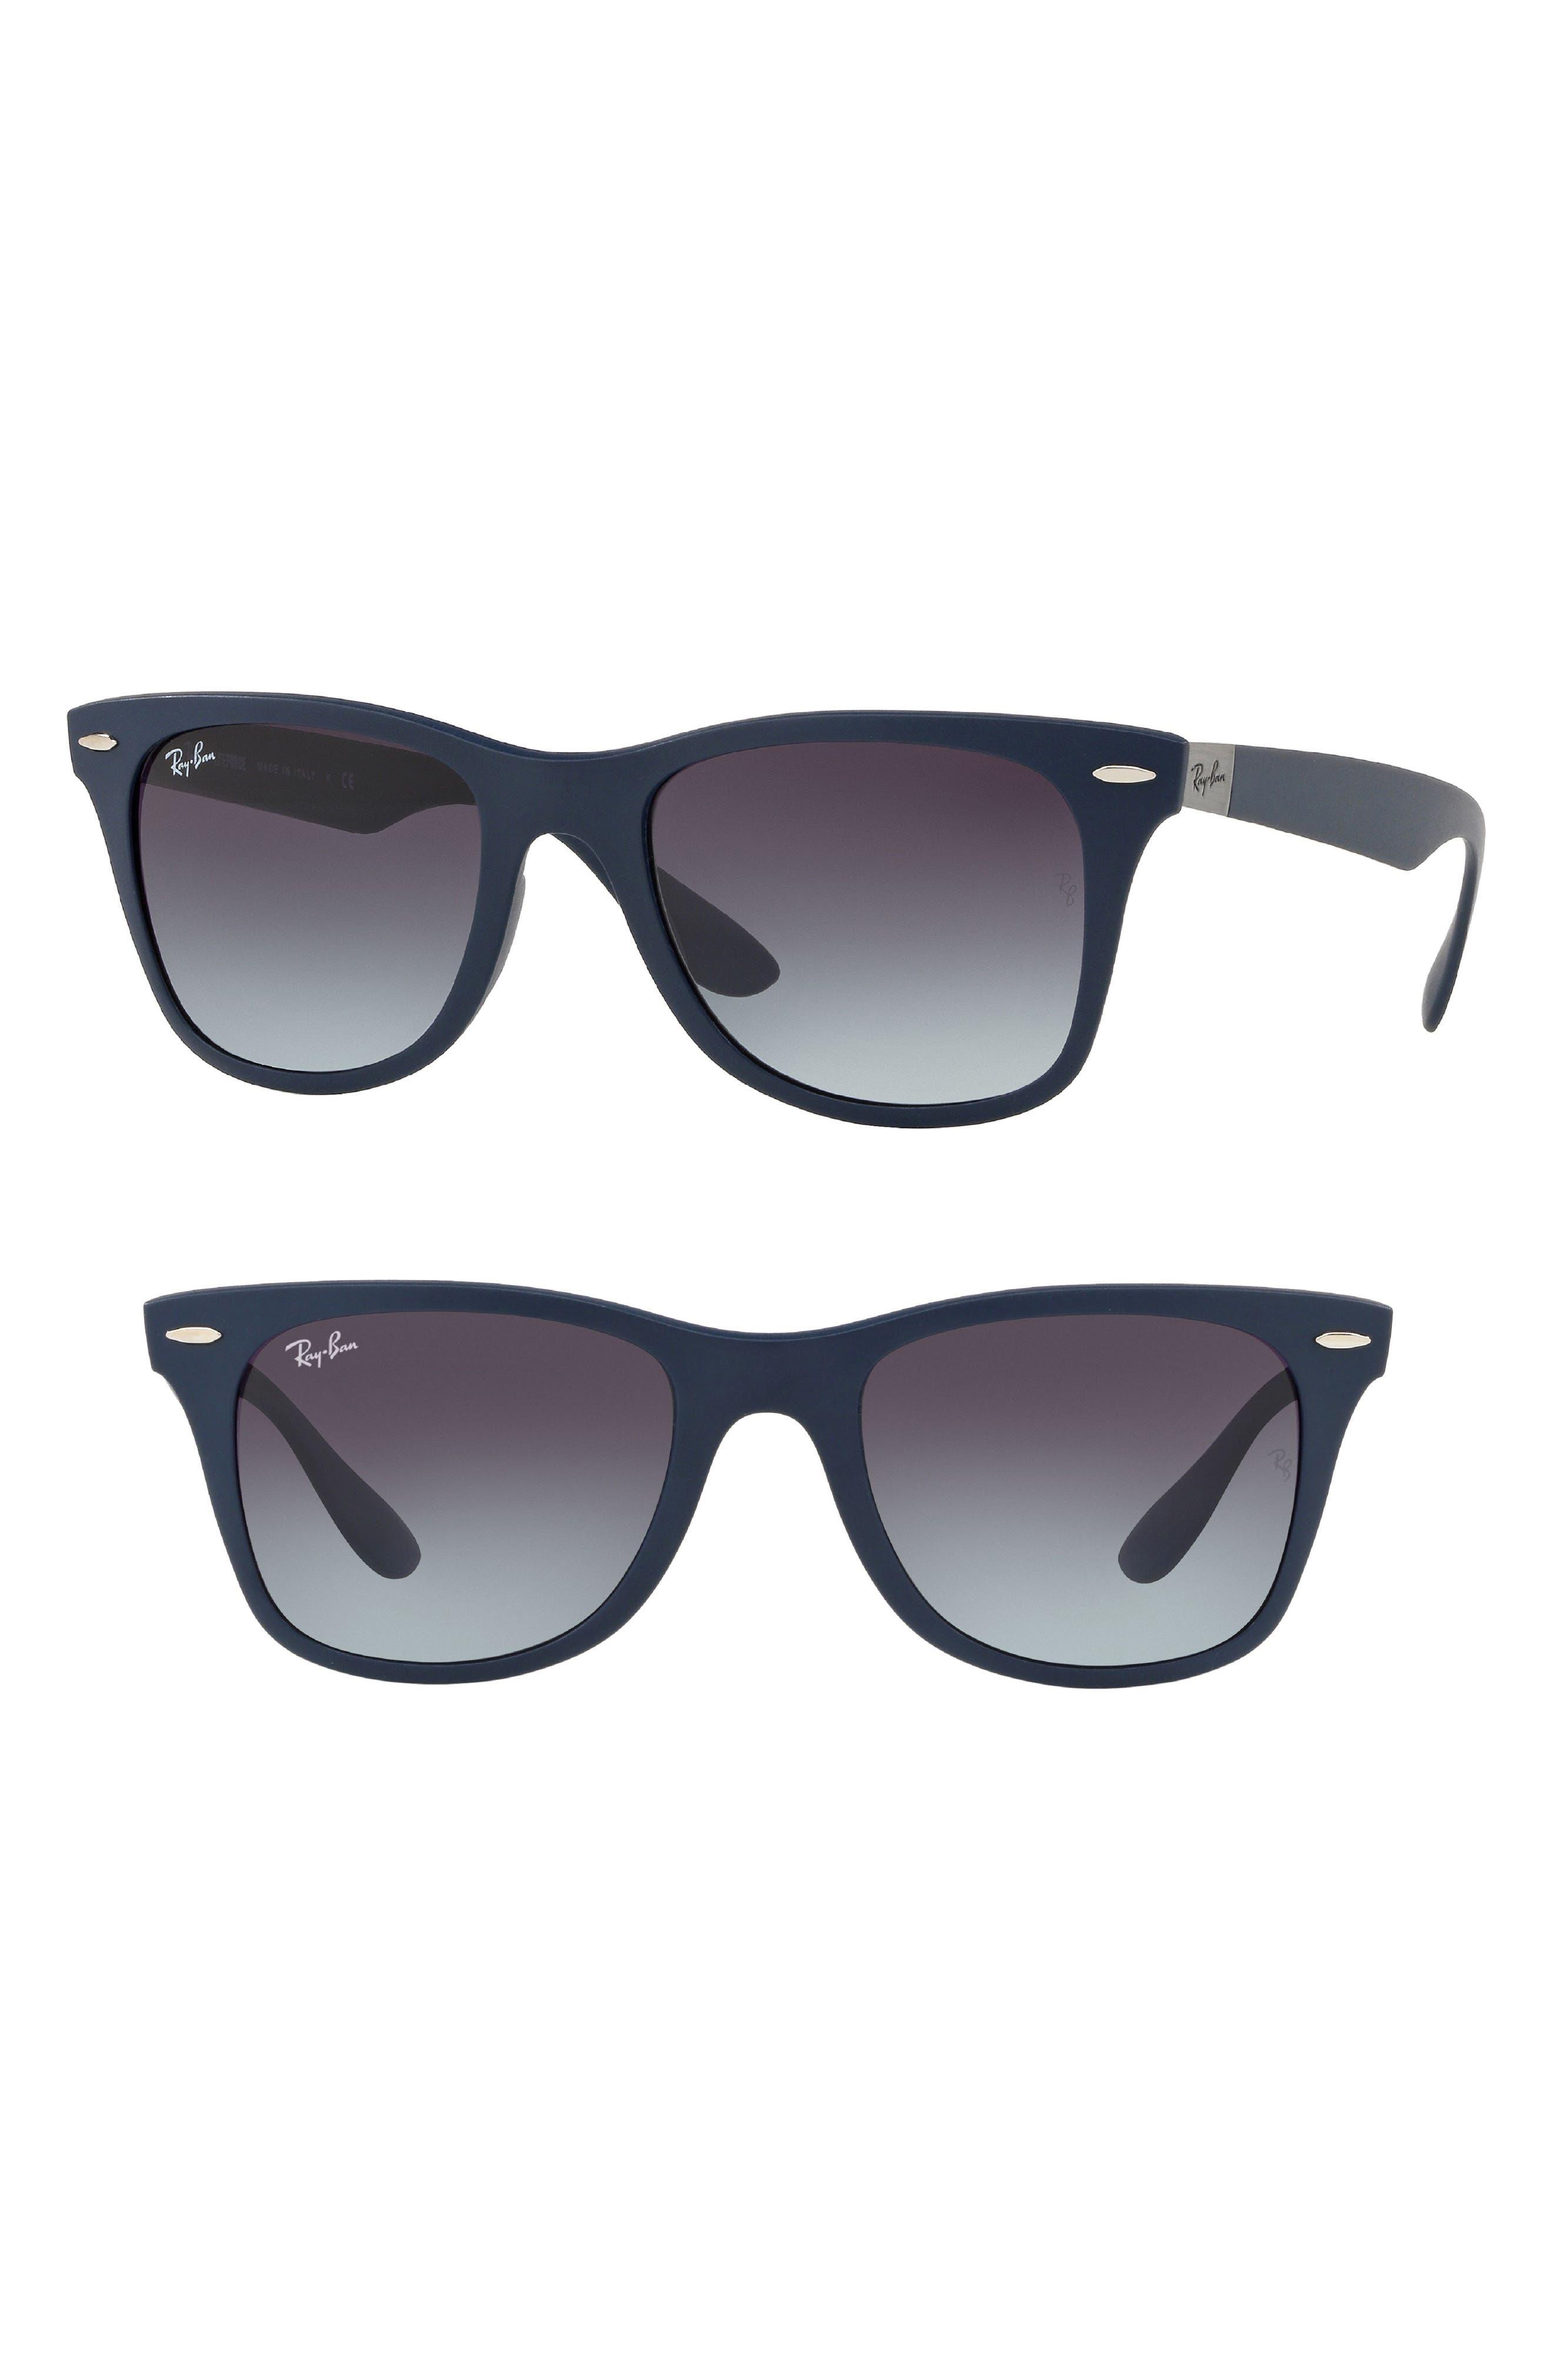 Wayfarer Liteforce 52mm Sunglasses,                         Main,                         color, Blue Grey